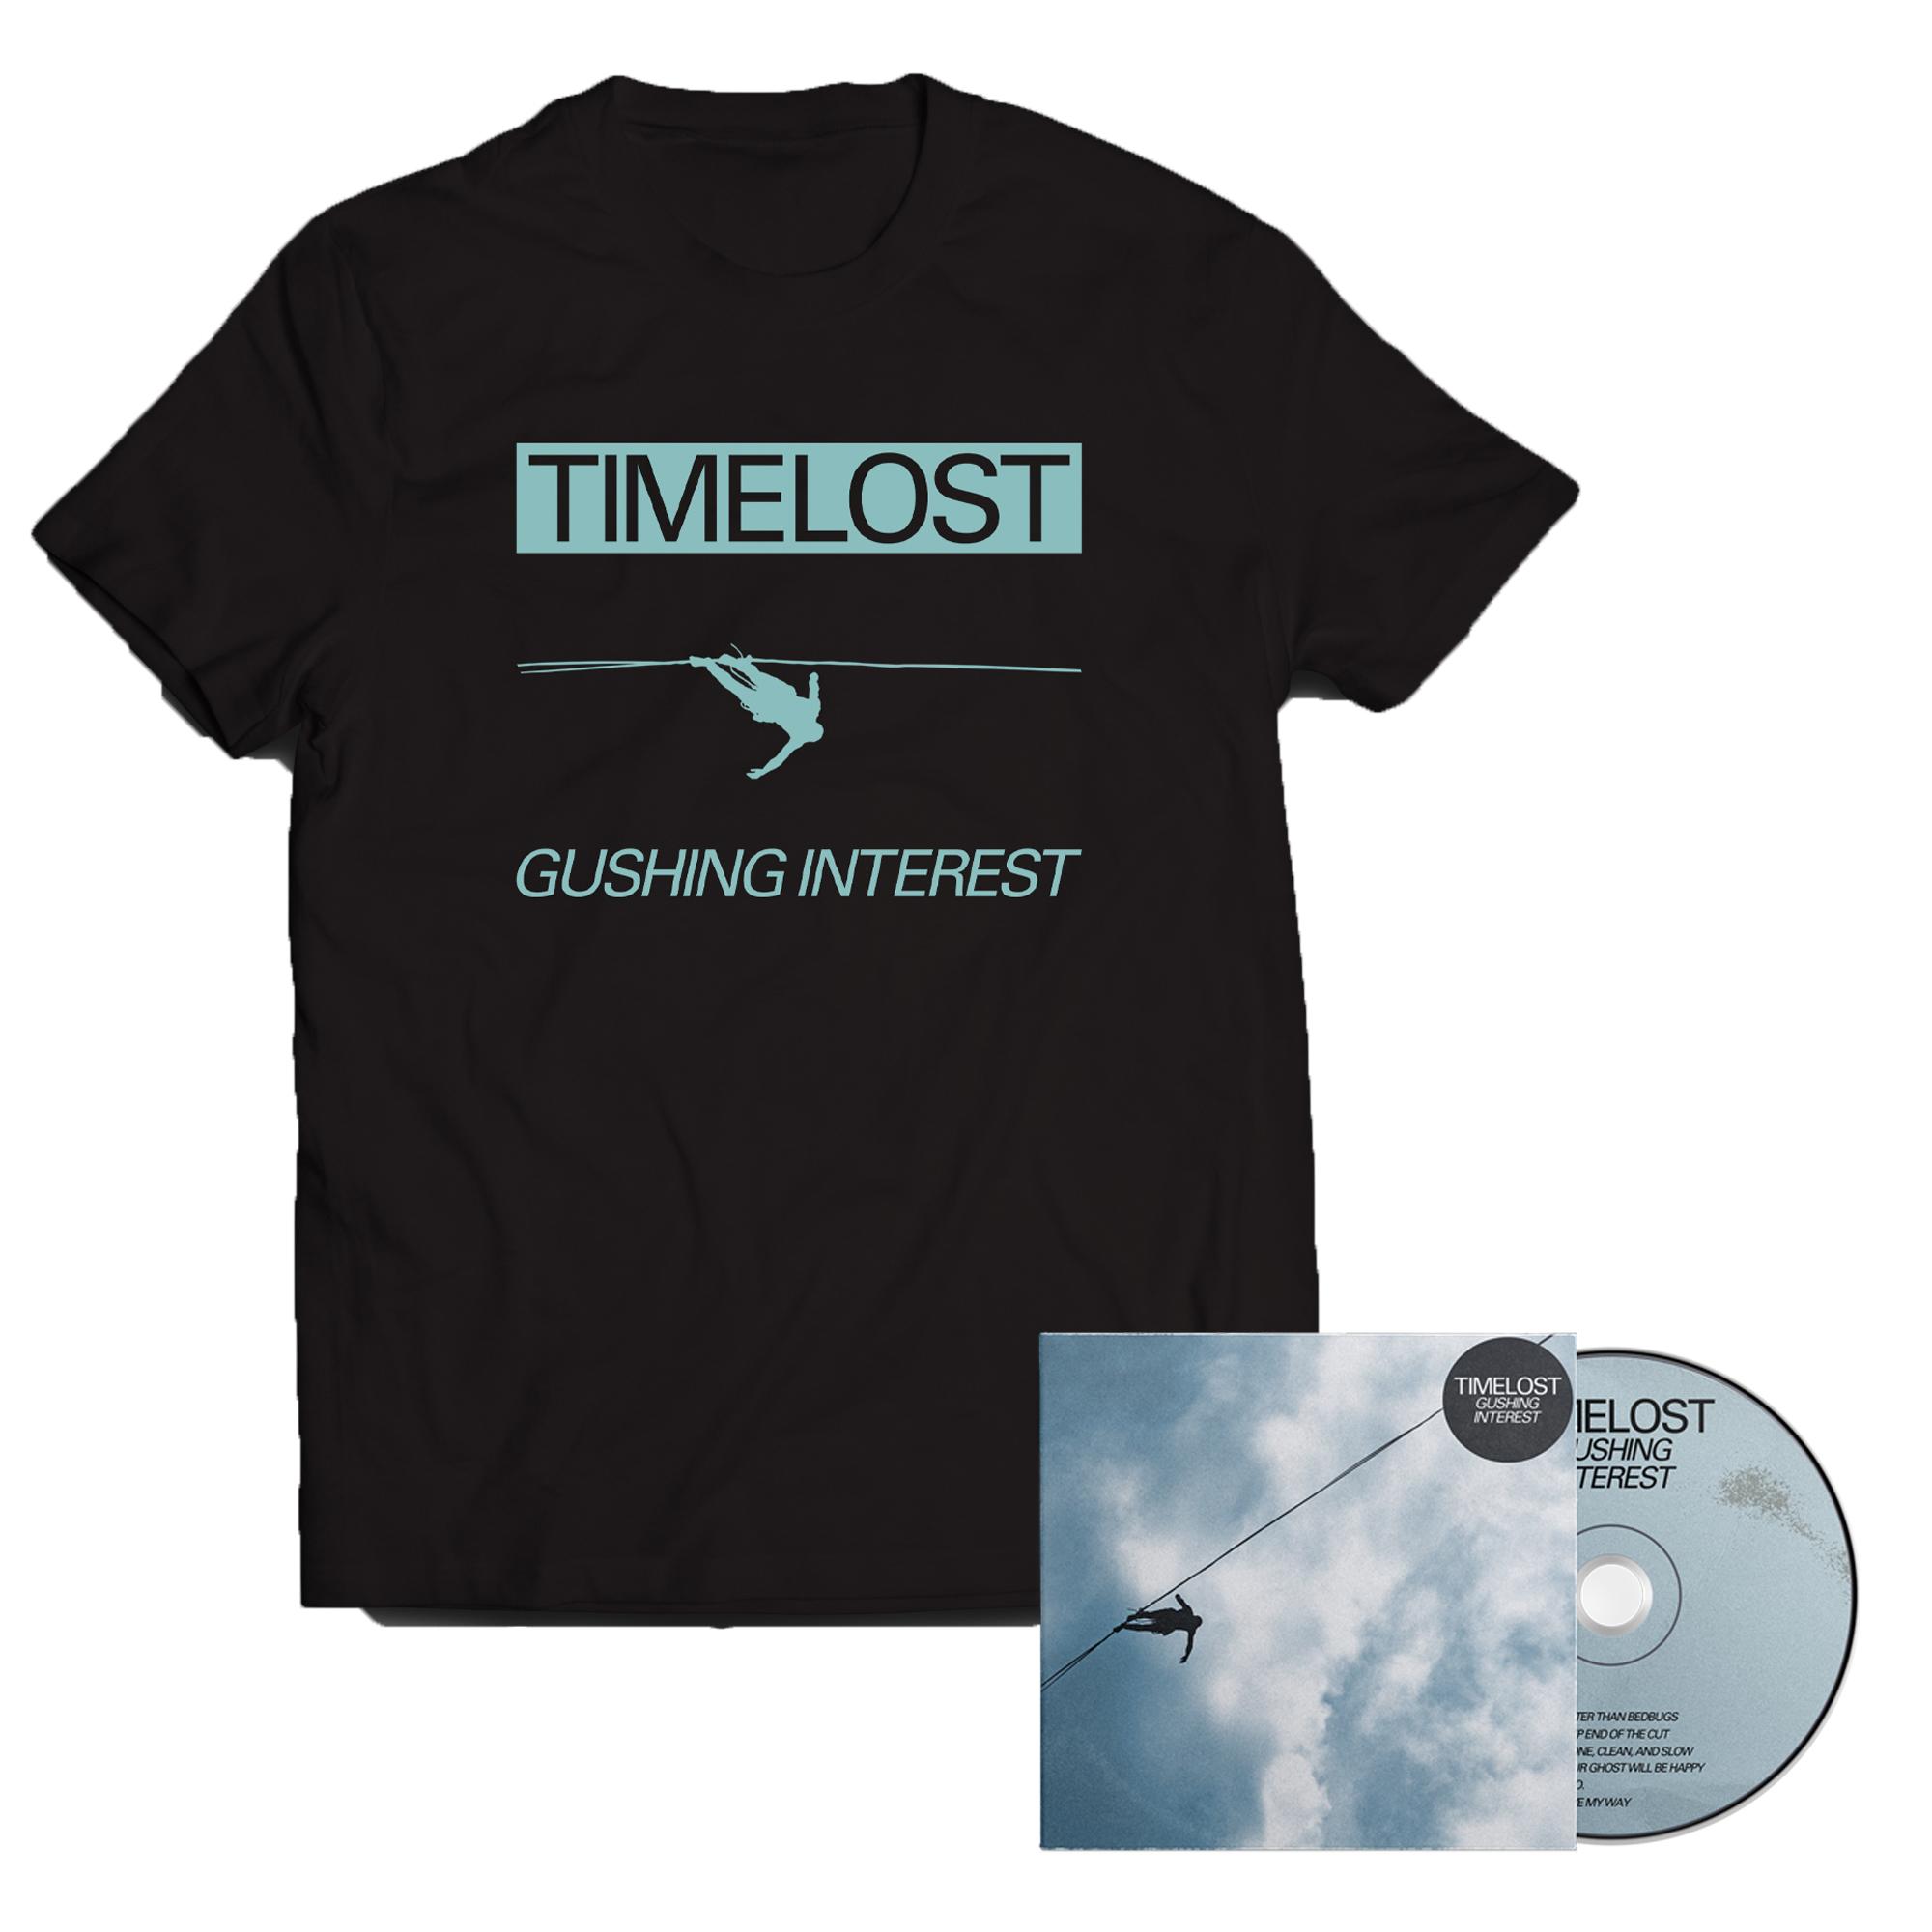 Timelost - Gushing Interest CD + shirt